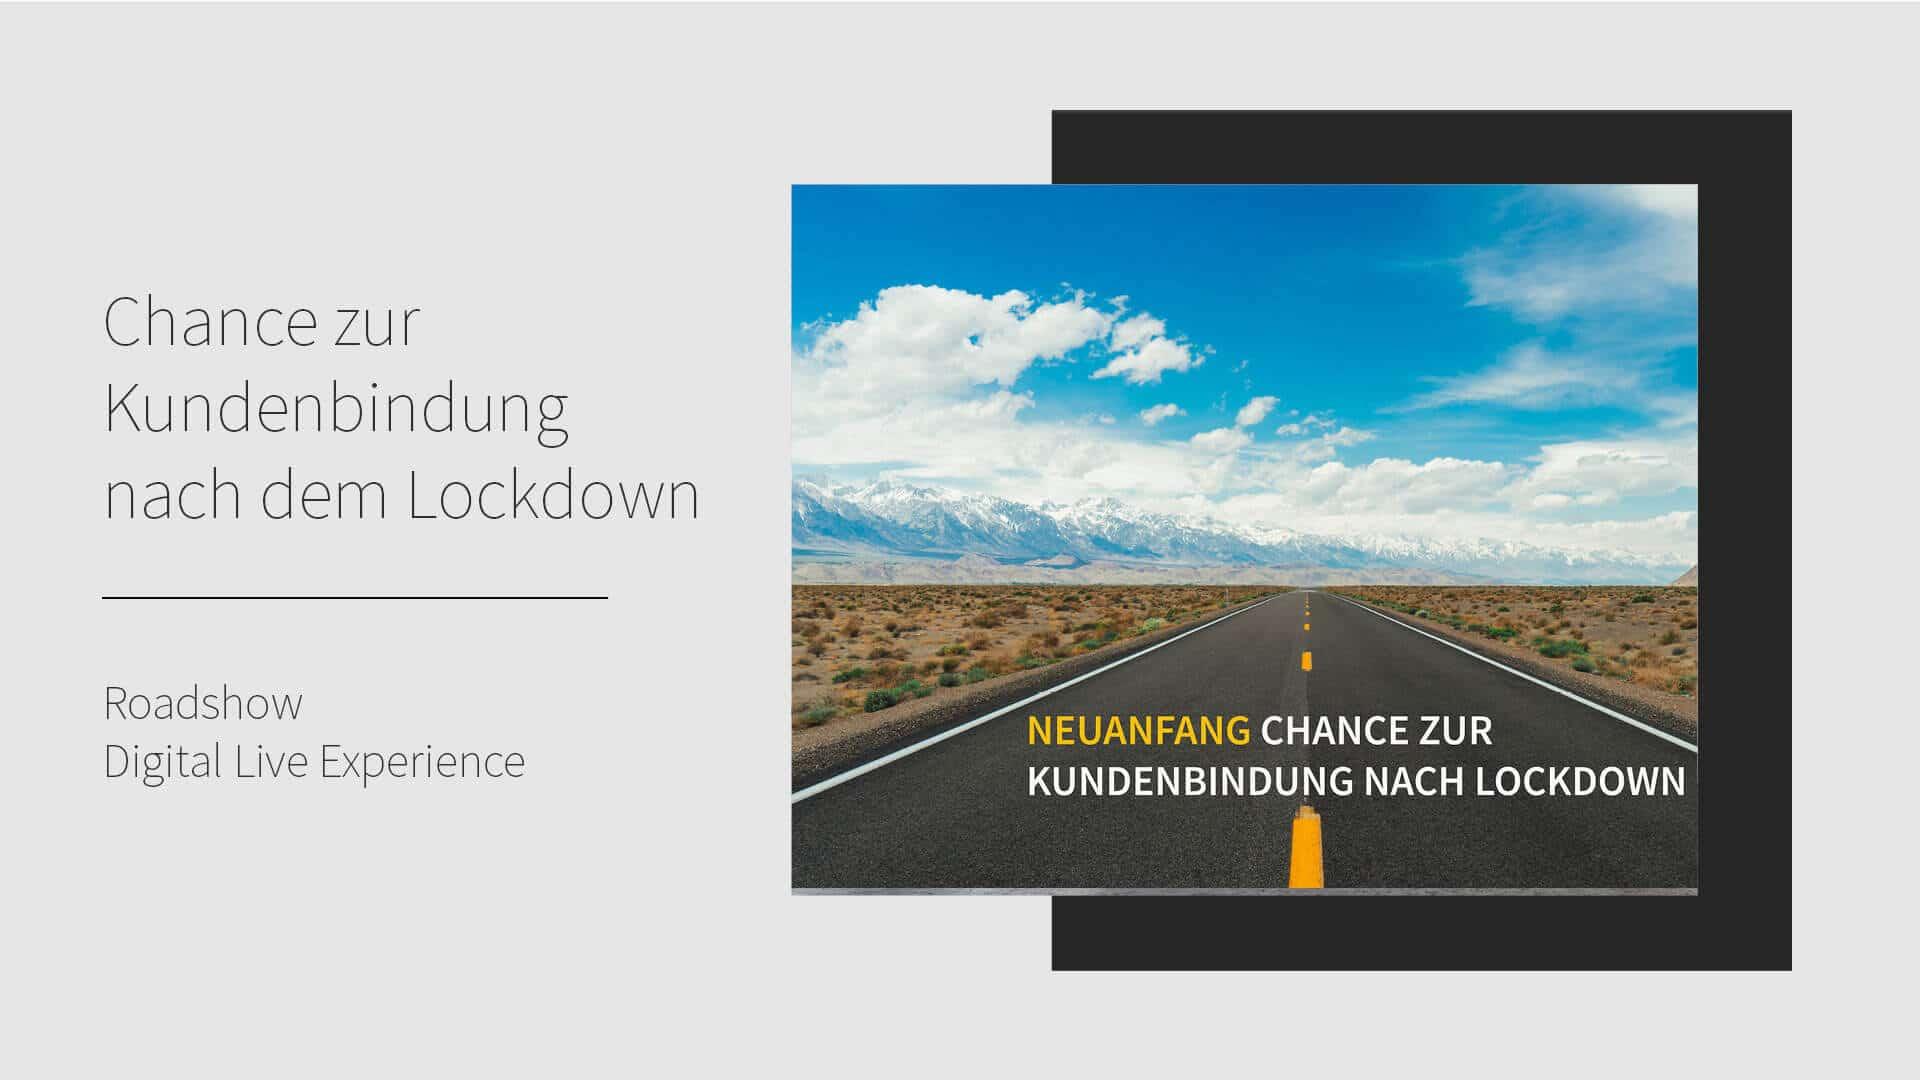 Chance zur Kundenbindung nach dem Lockdown - Roadshow Digital Live Experience